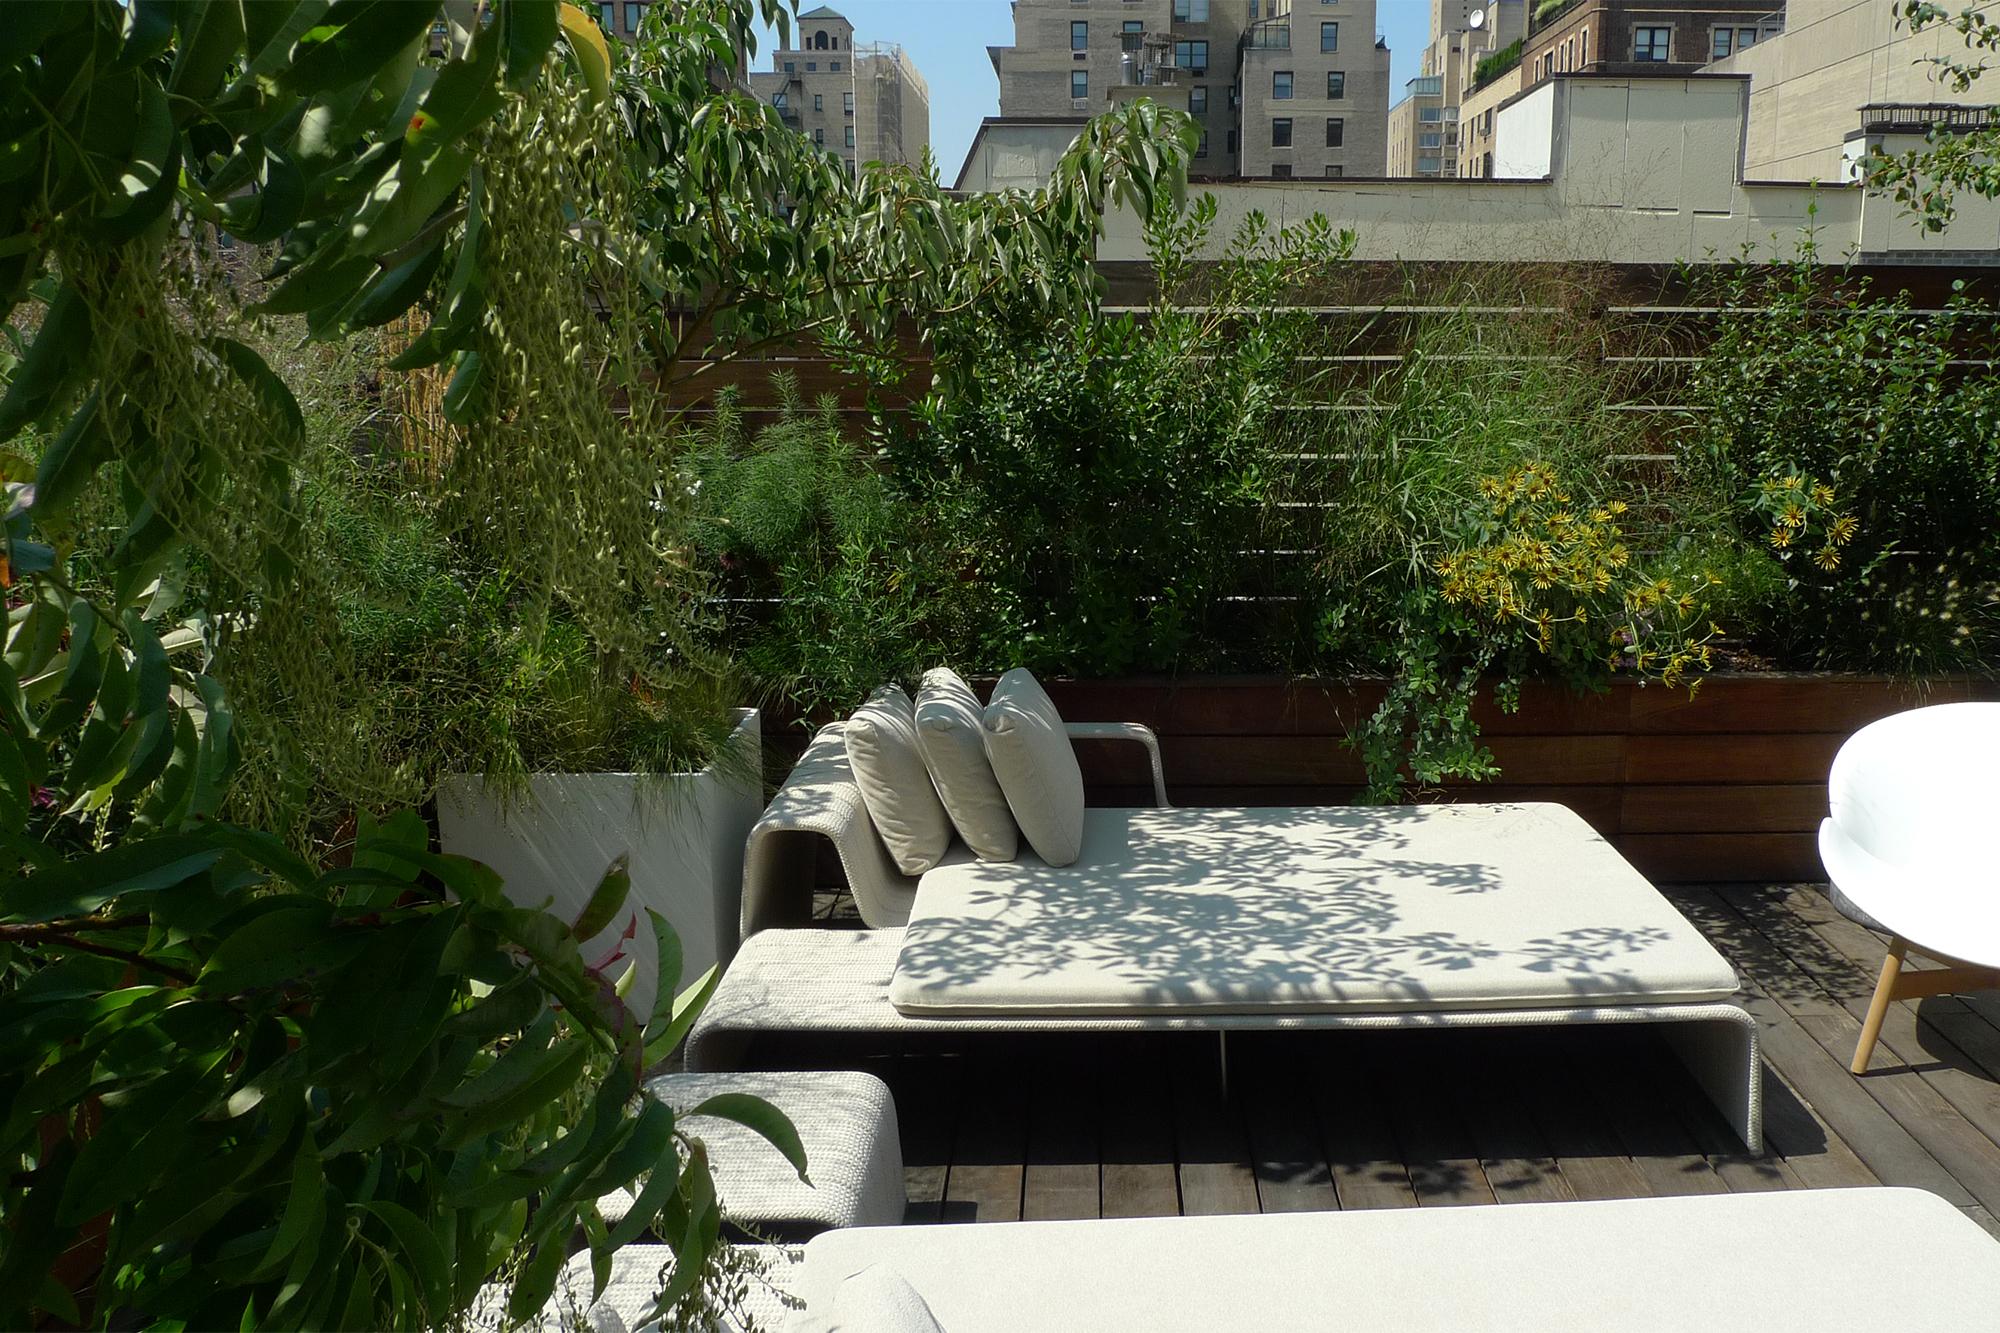 VERDANT, Casa Blanc, Mac Carbonell designer, Contemporary landscape, New York landscape design